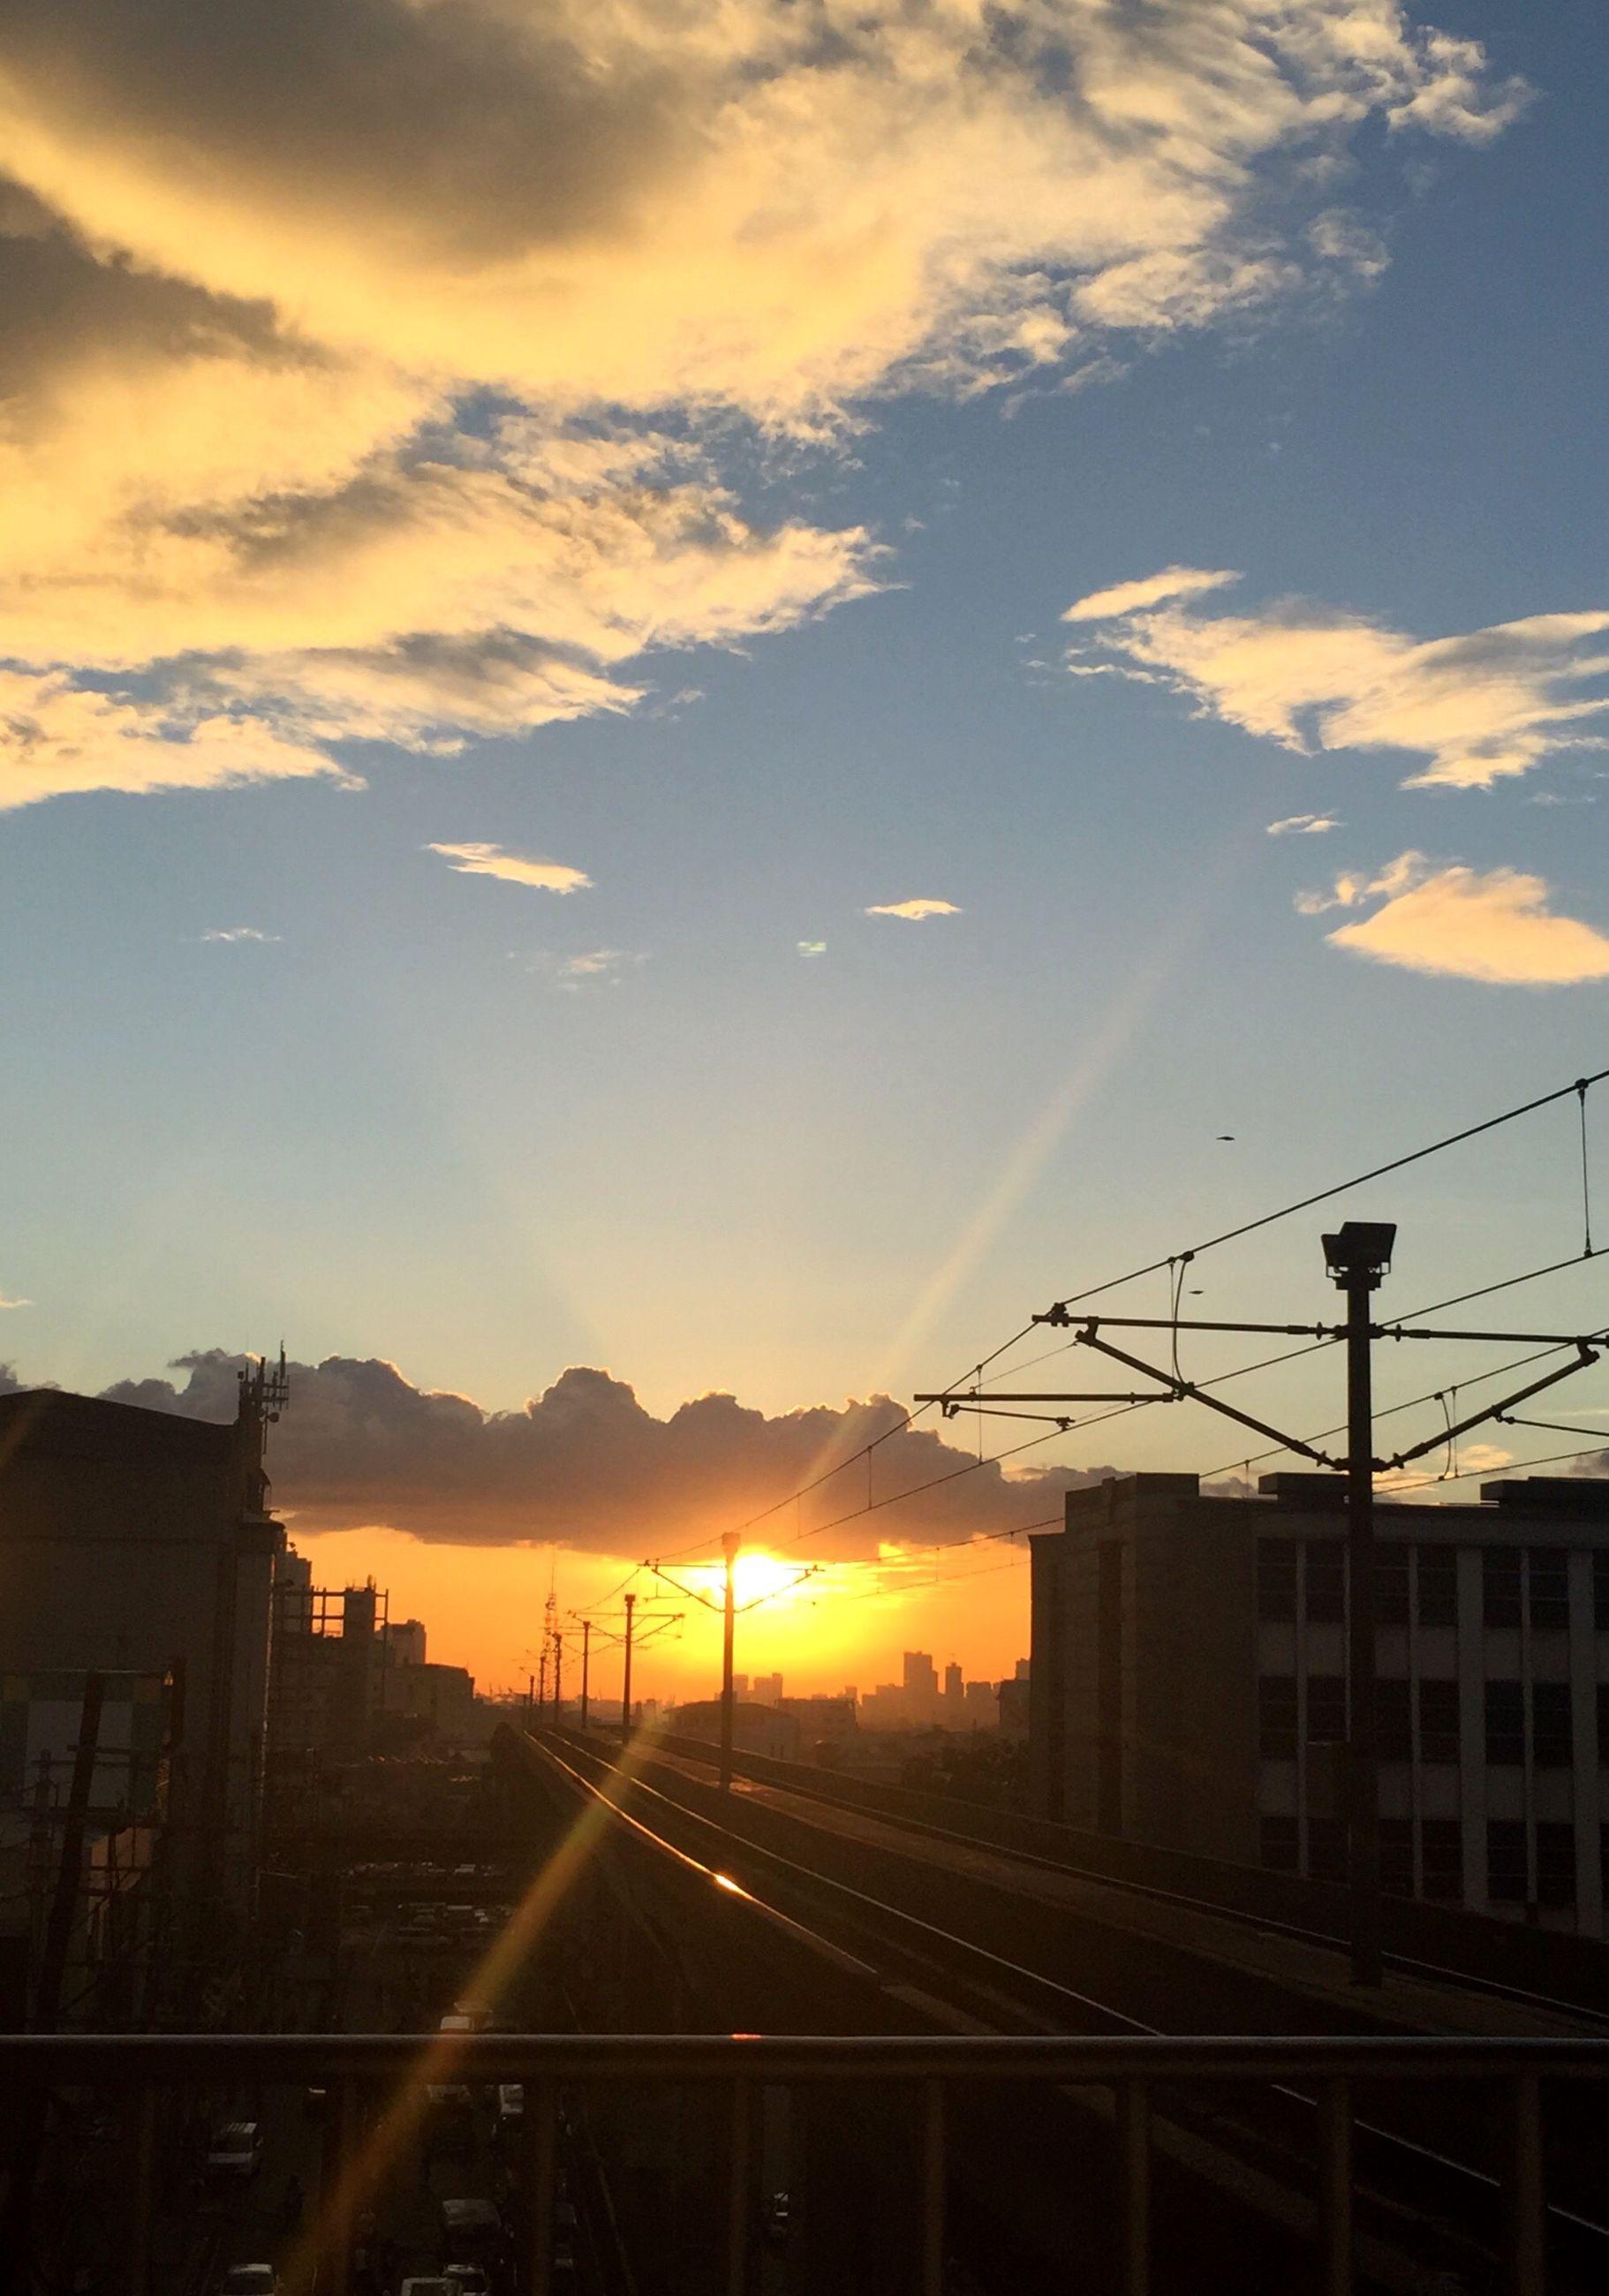 sunset, architecture, built structure, building exterior, orange color, sky, sun, silhouette, city, cloud - sky, sunlight, connection, cloud, outdoors, transportation, railroad track, no people, sunbeam, power line, building